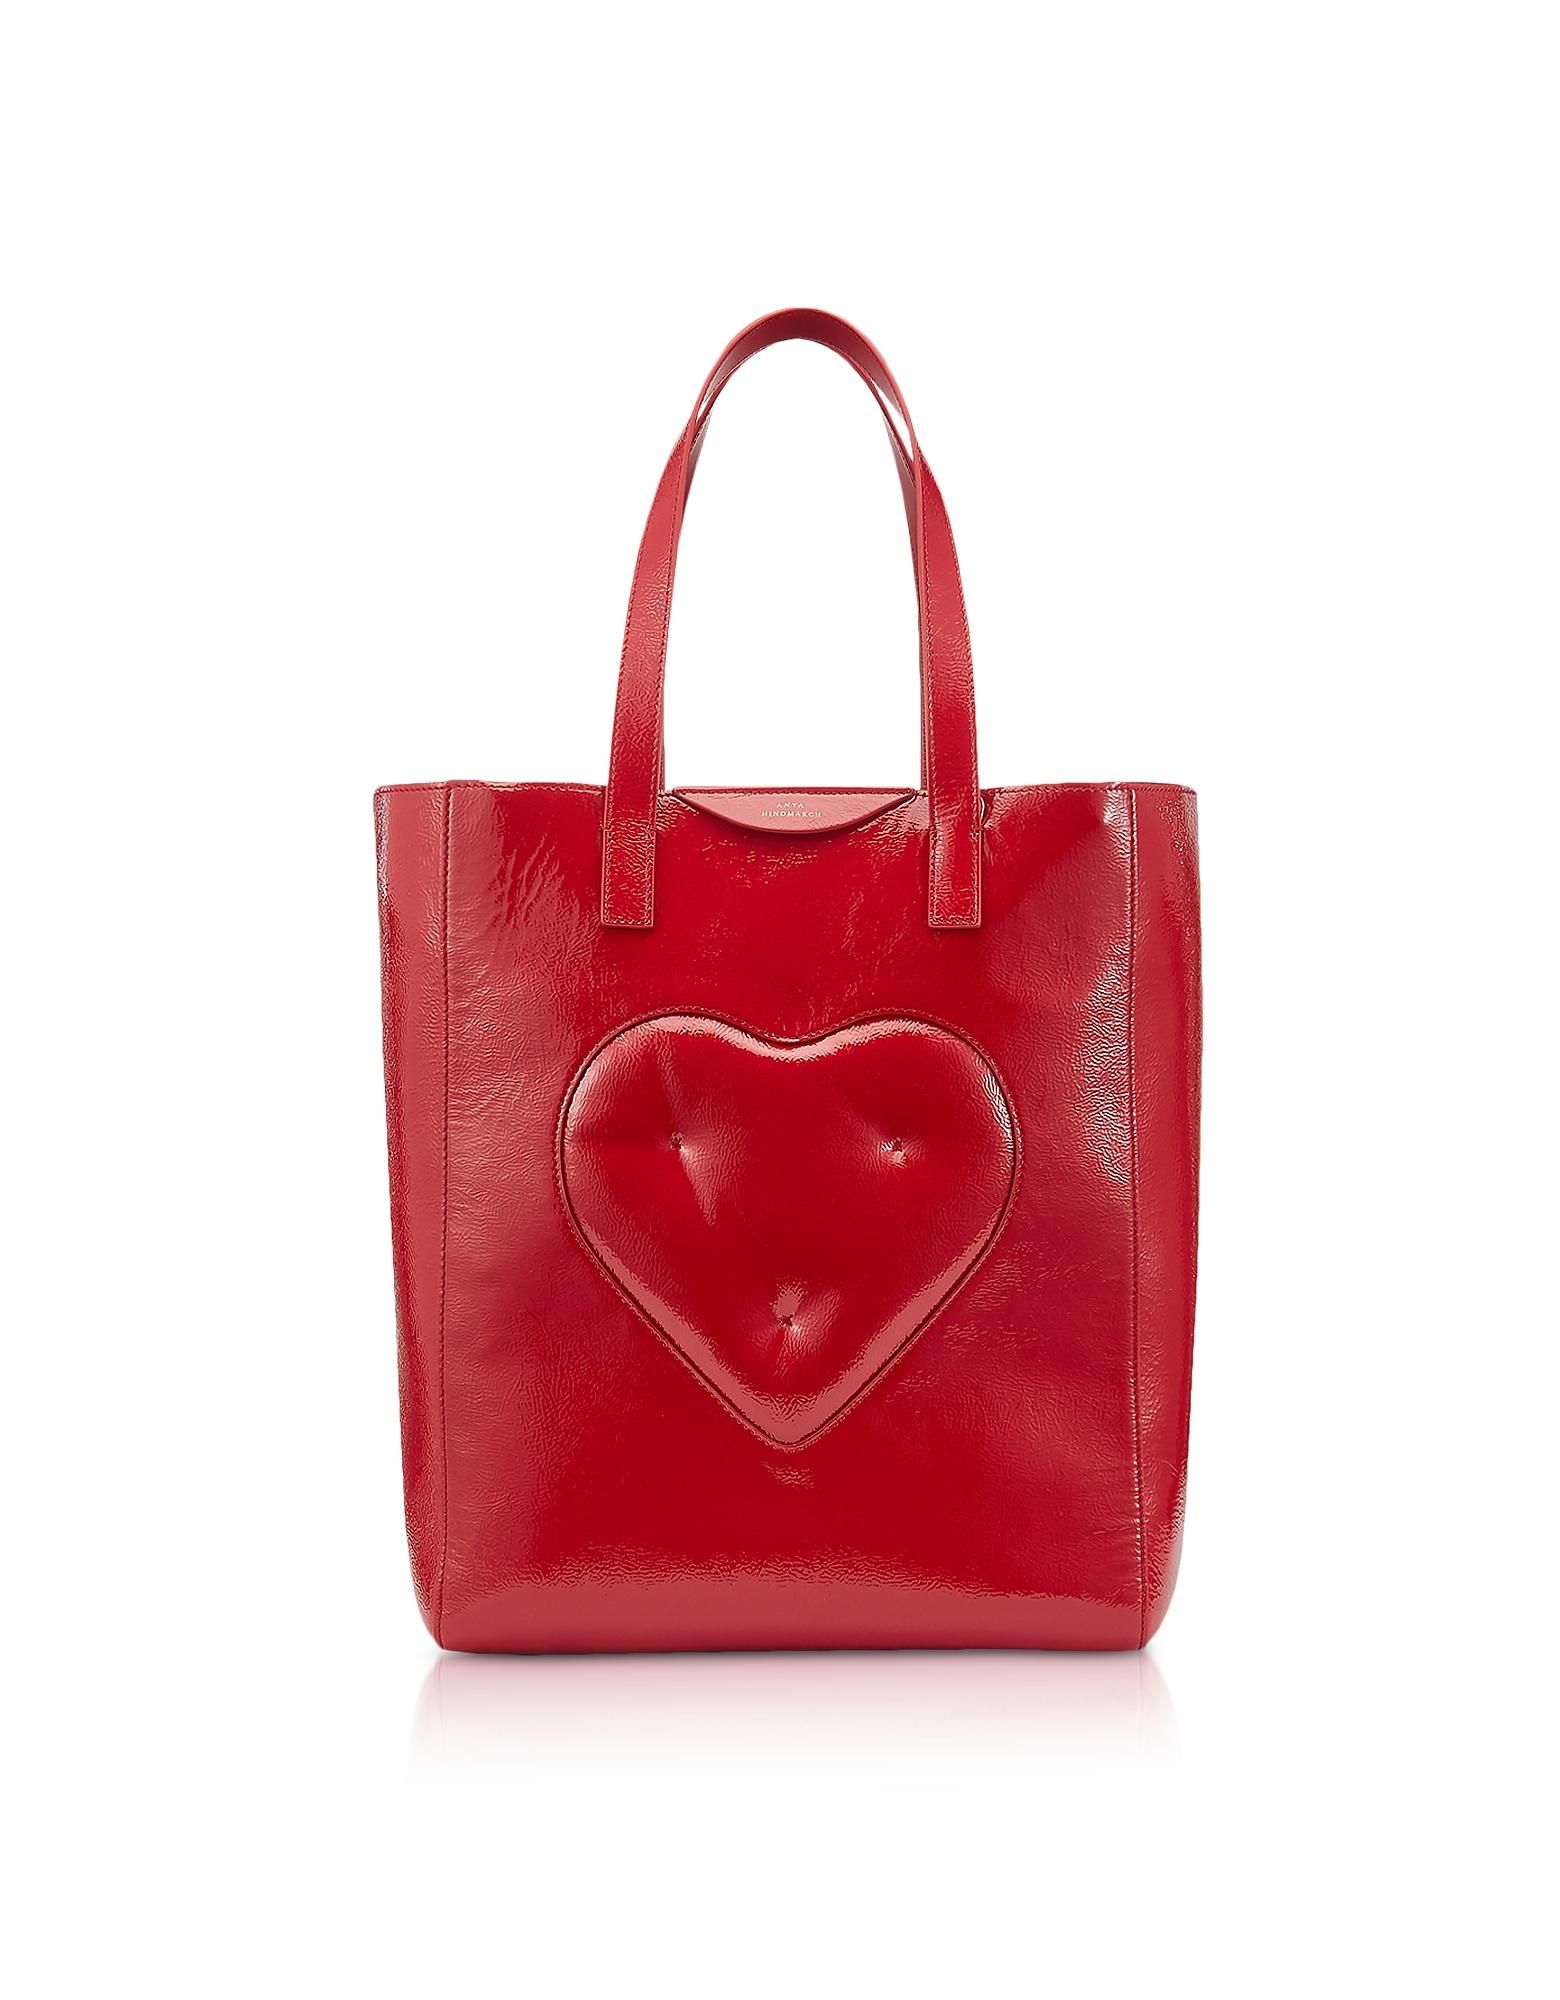 Image of Anya Hindmarch Designer Handbags, Dark Red Naplak Chubby Heart Tote Bag